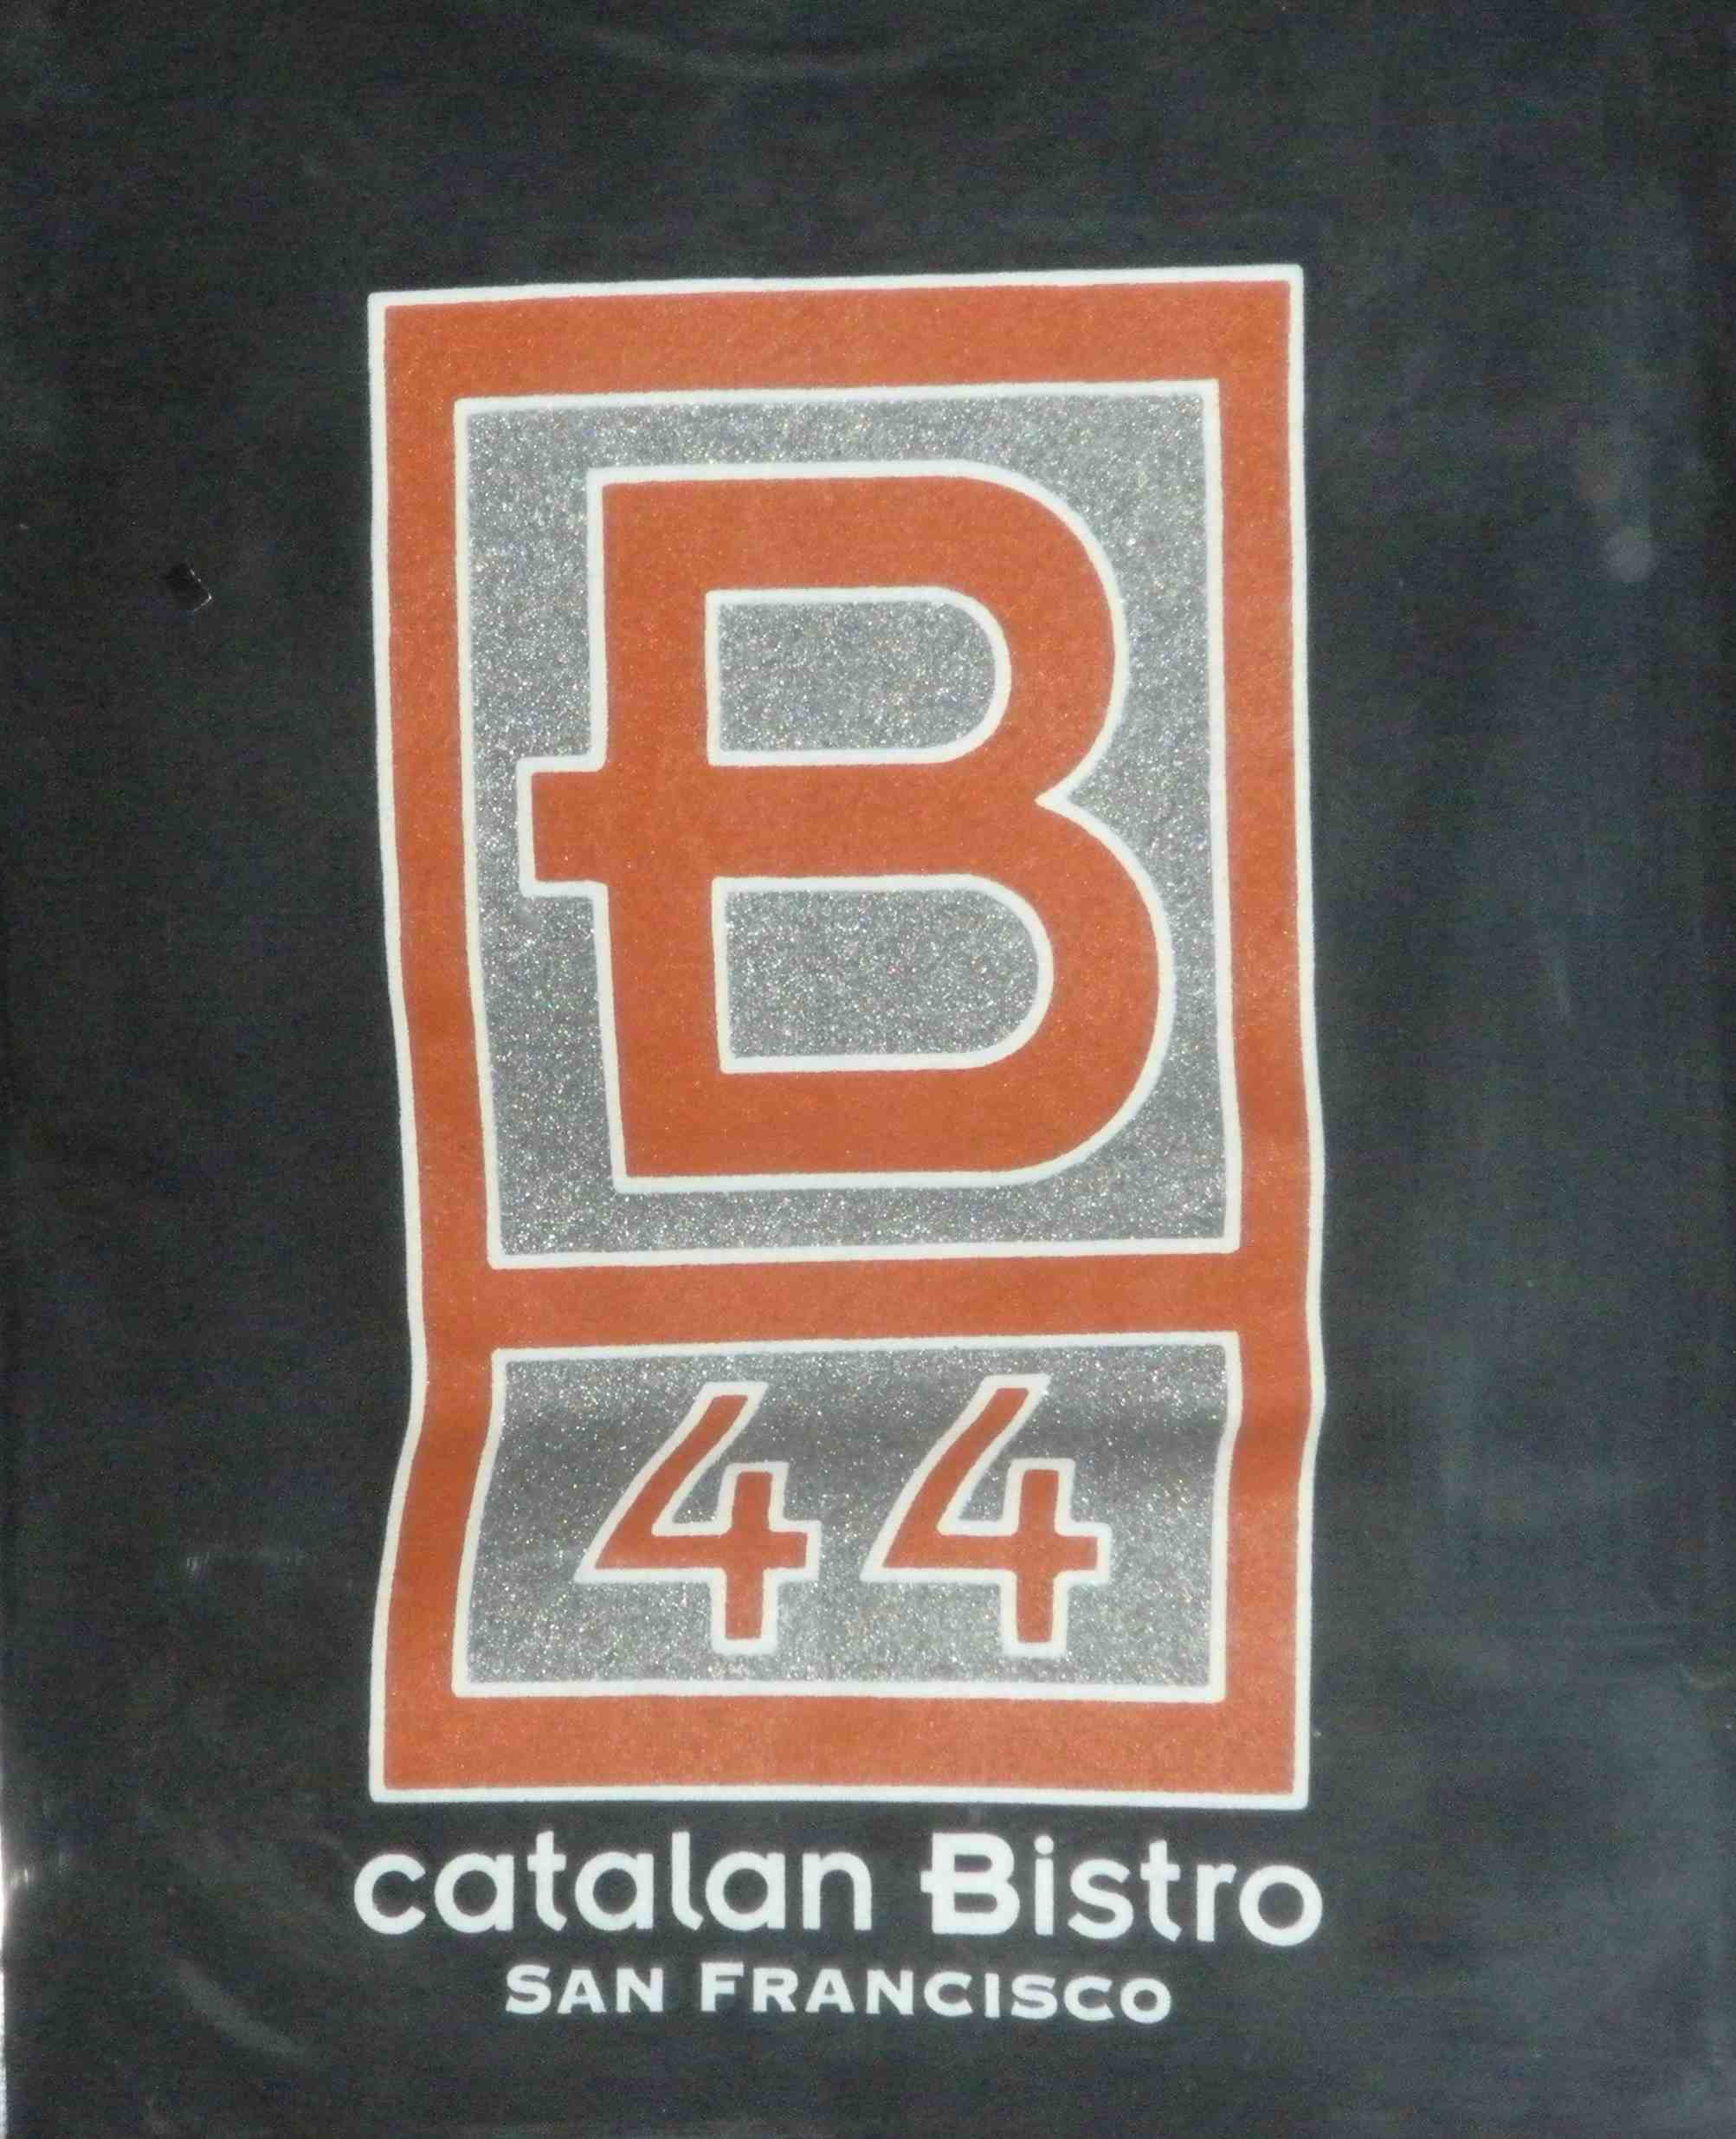 b44 Logo